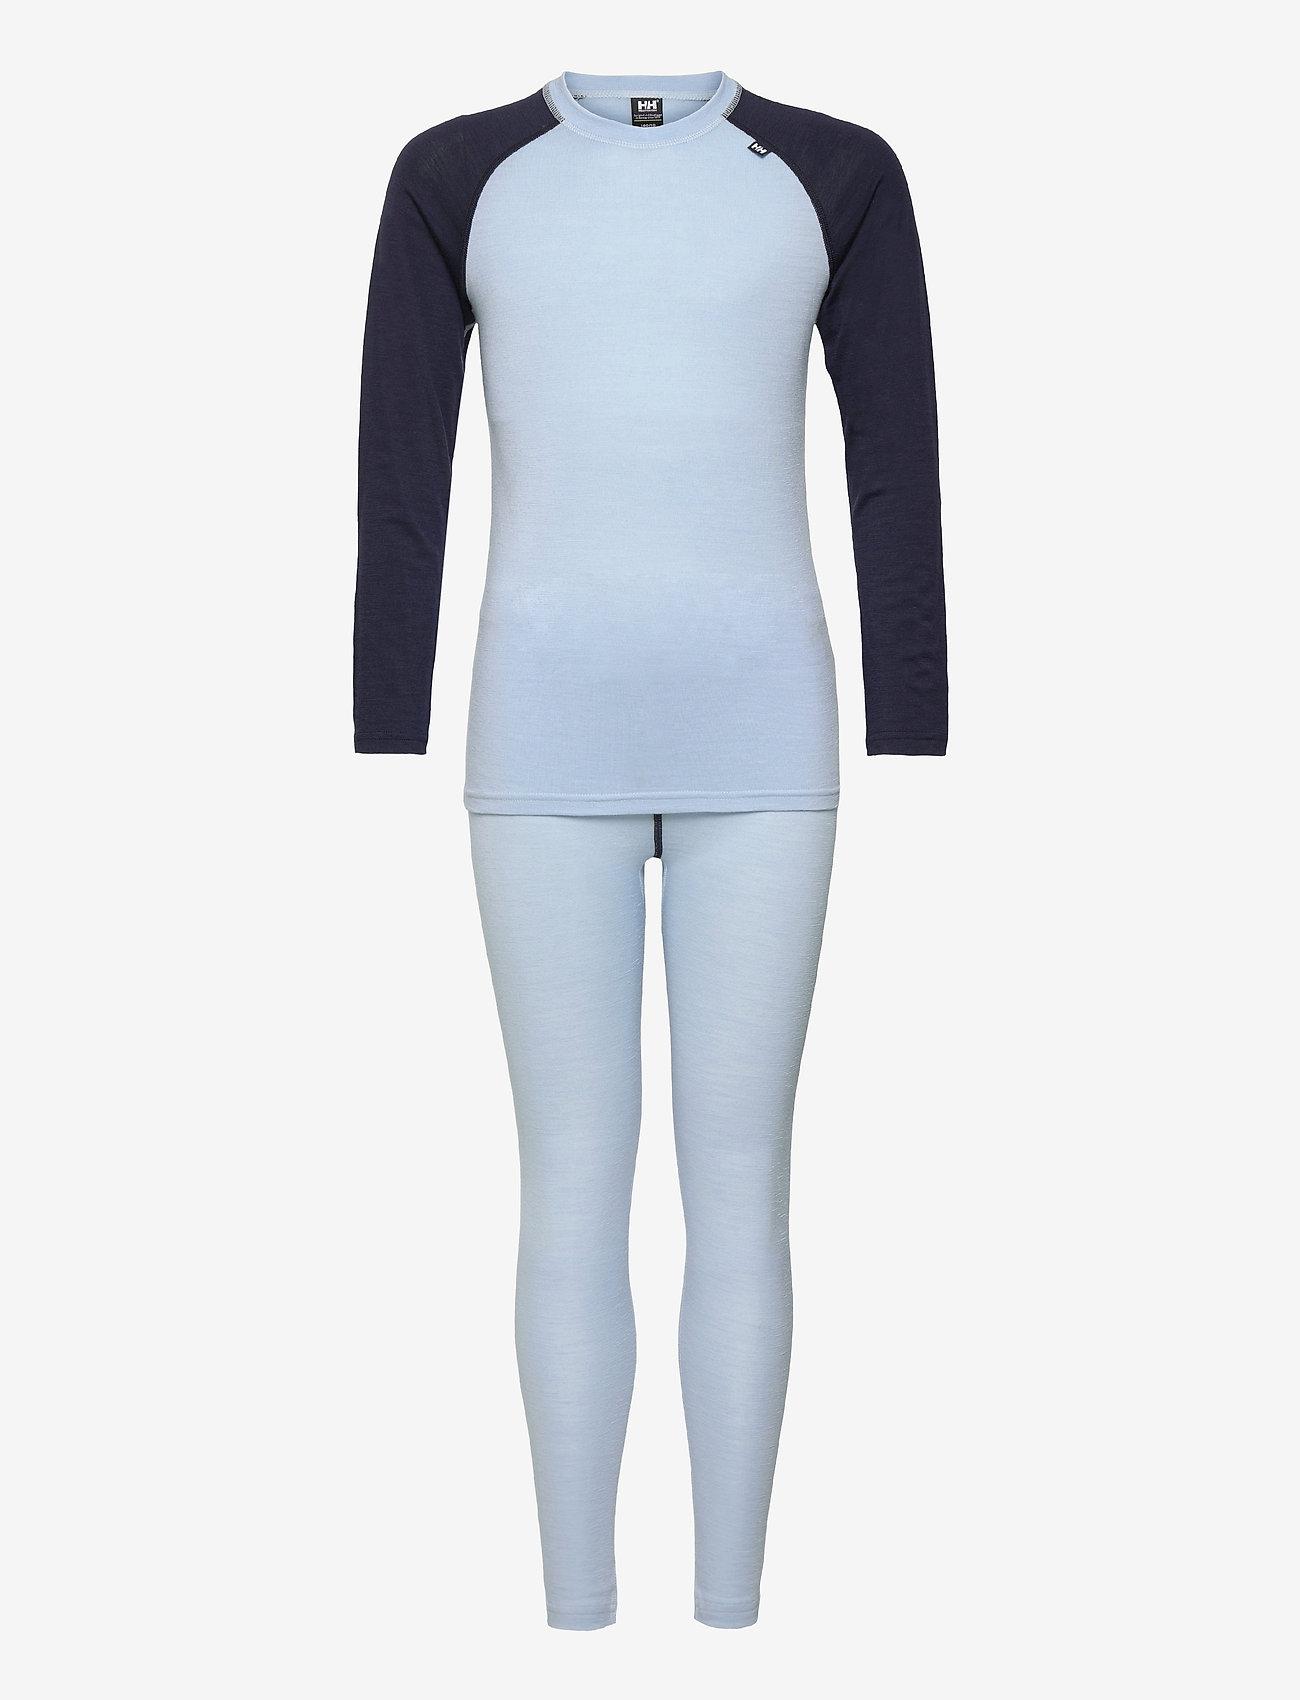 Helly Hansen - JR HH MERINO MID SET - ondergoedsets - ice blue - 0